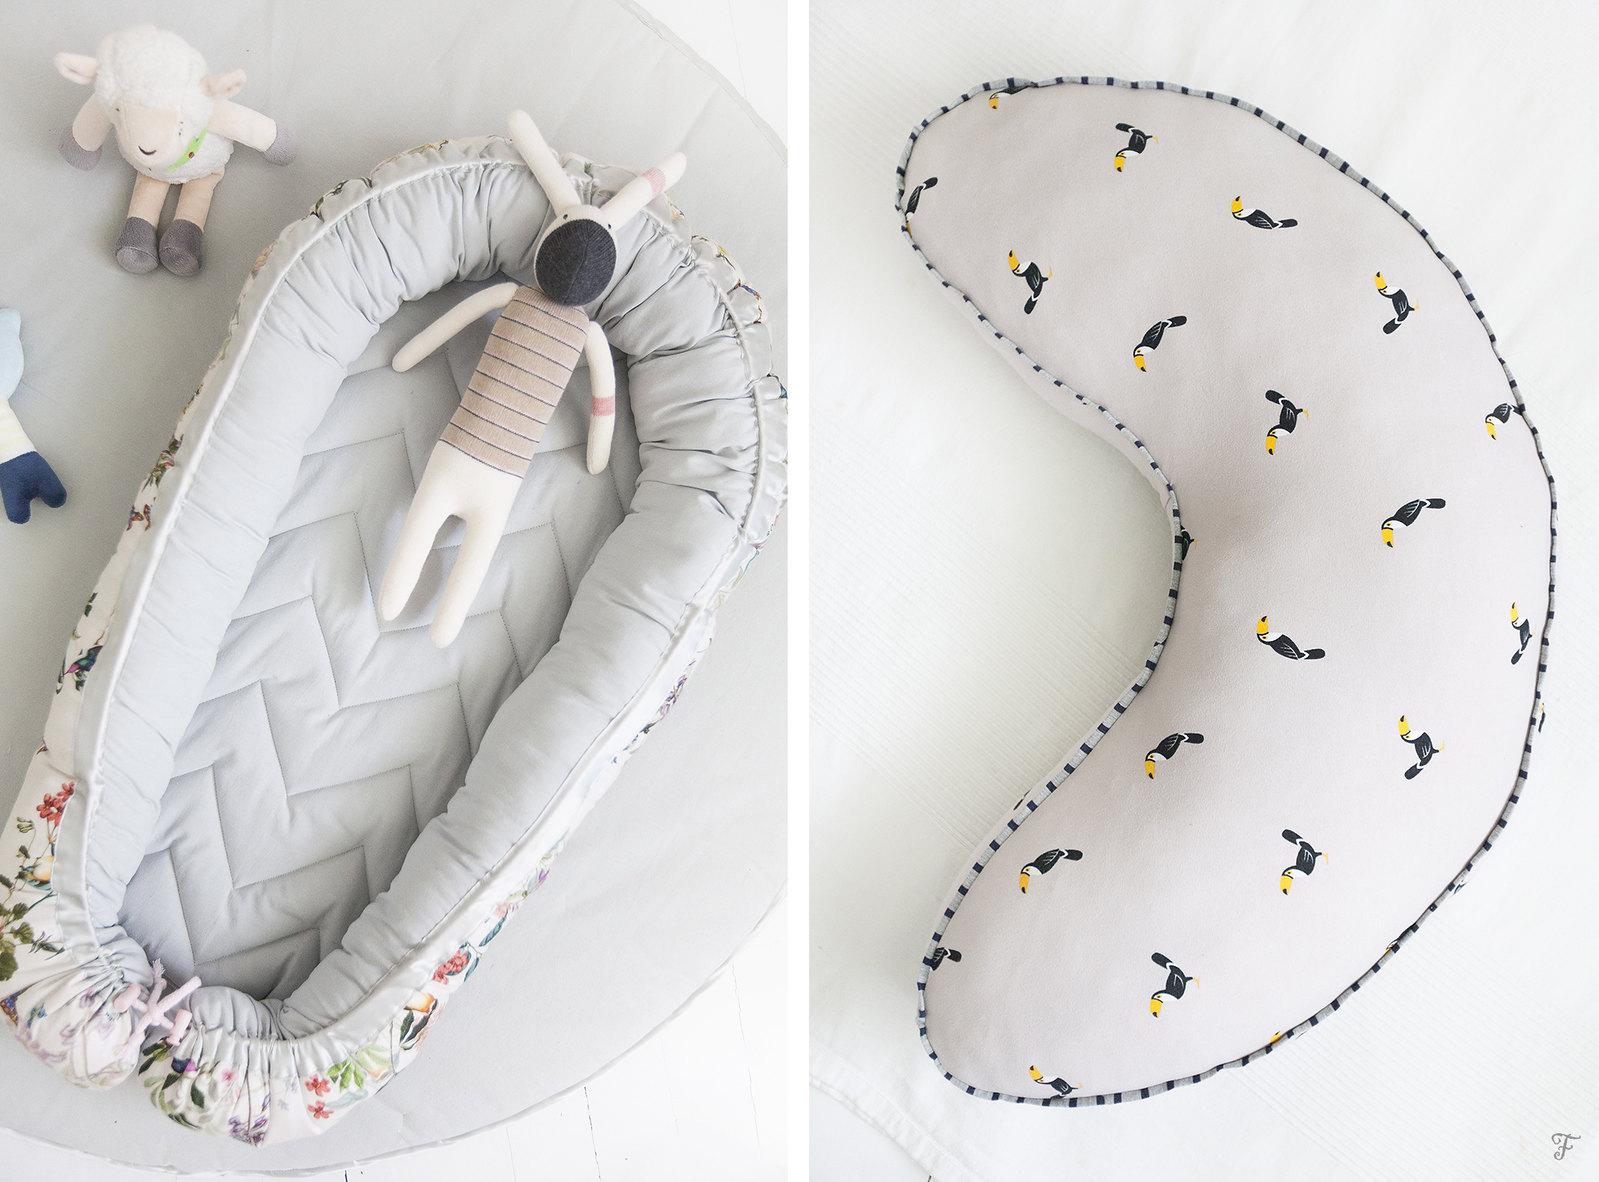 baby gear diy nest play pad eye stimulant fensismensi